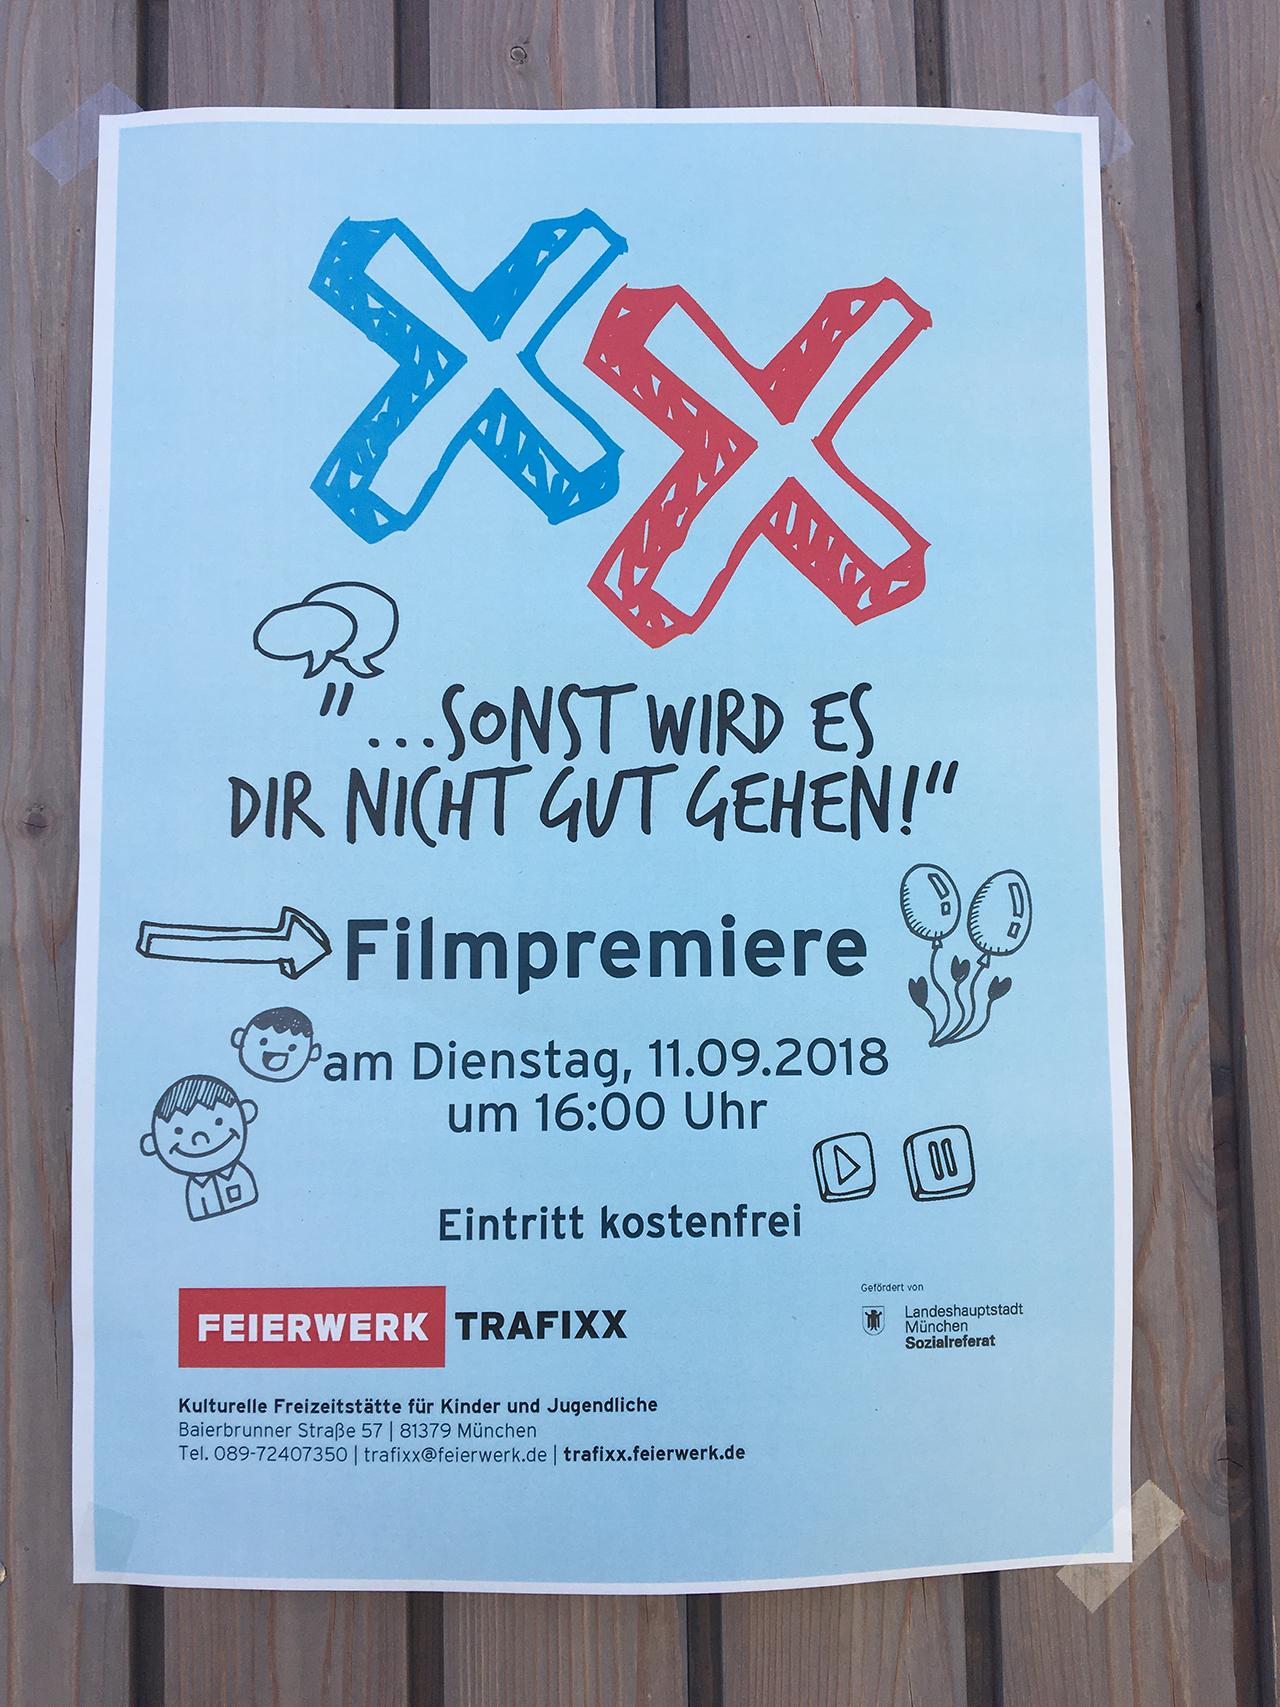 Feierwerk_Blog_Trafixx_Filmprojekt_Kinderrechte_Filmplakat